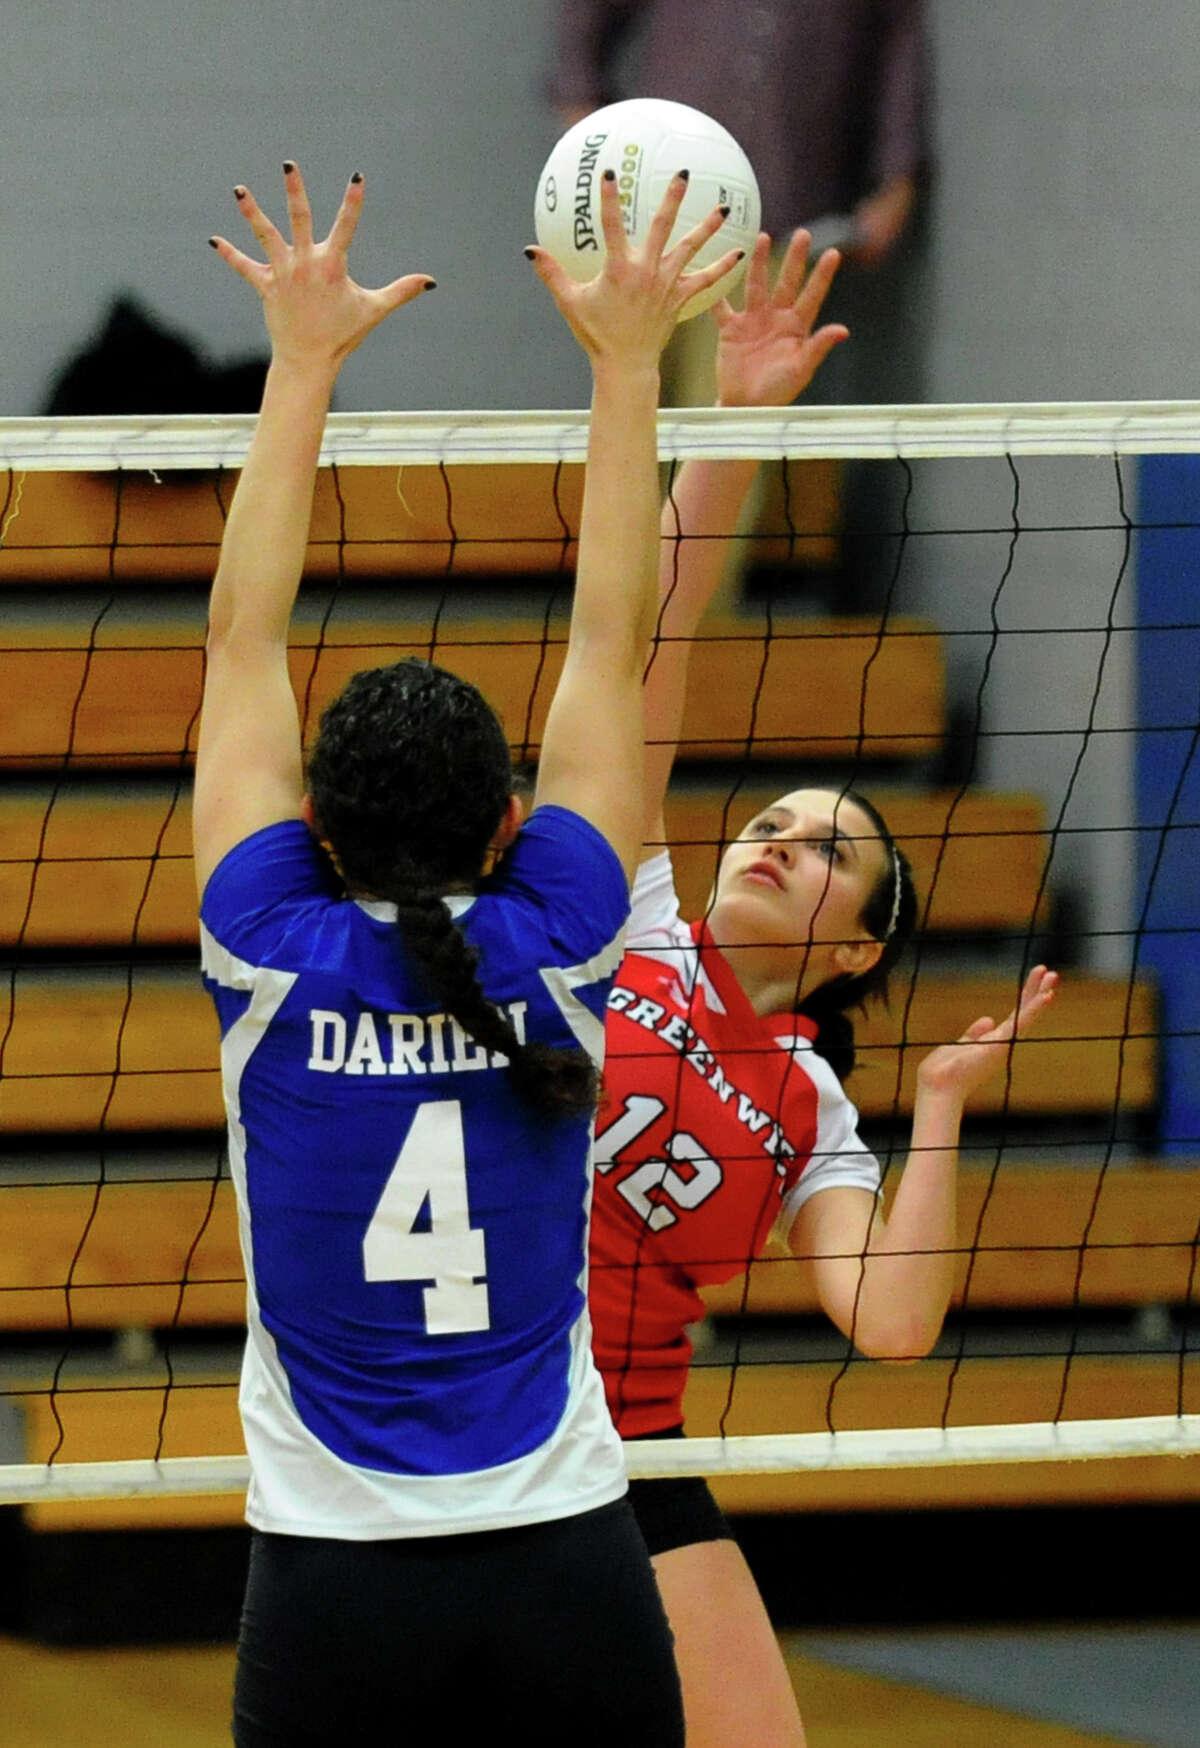 Greenwich's #12 Gennifer Pflug tries to send the ball past Darien's #4 Lauren Pryor, during FCIAC Girls' Volleyball Semi-final action in Fairfield, Conn. on Thursday November 8, 2012.